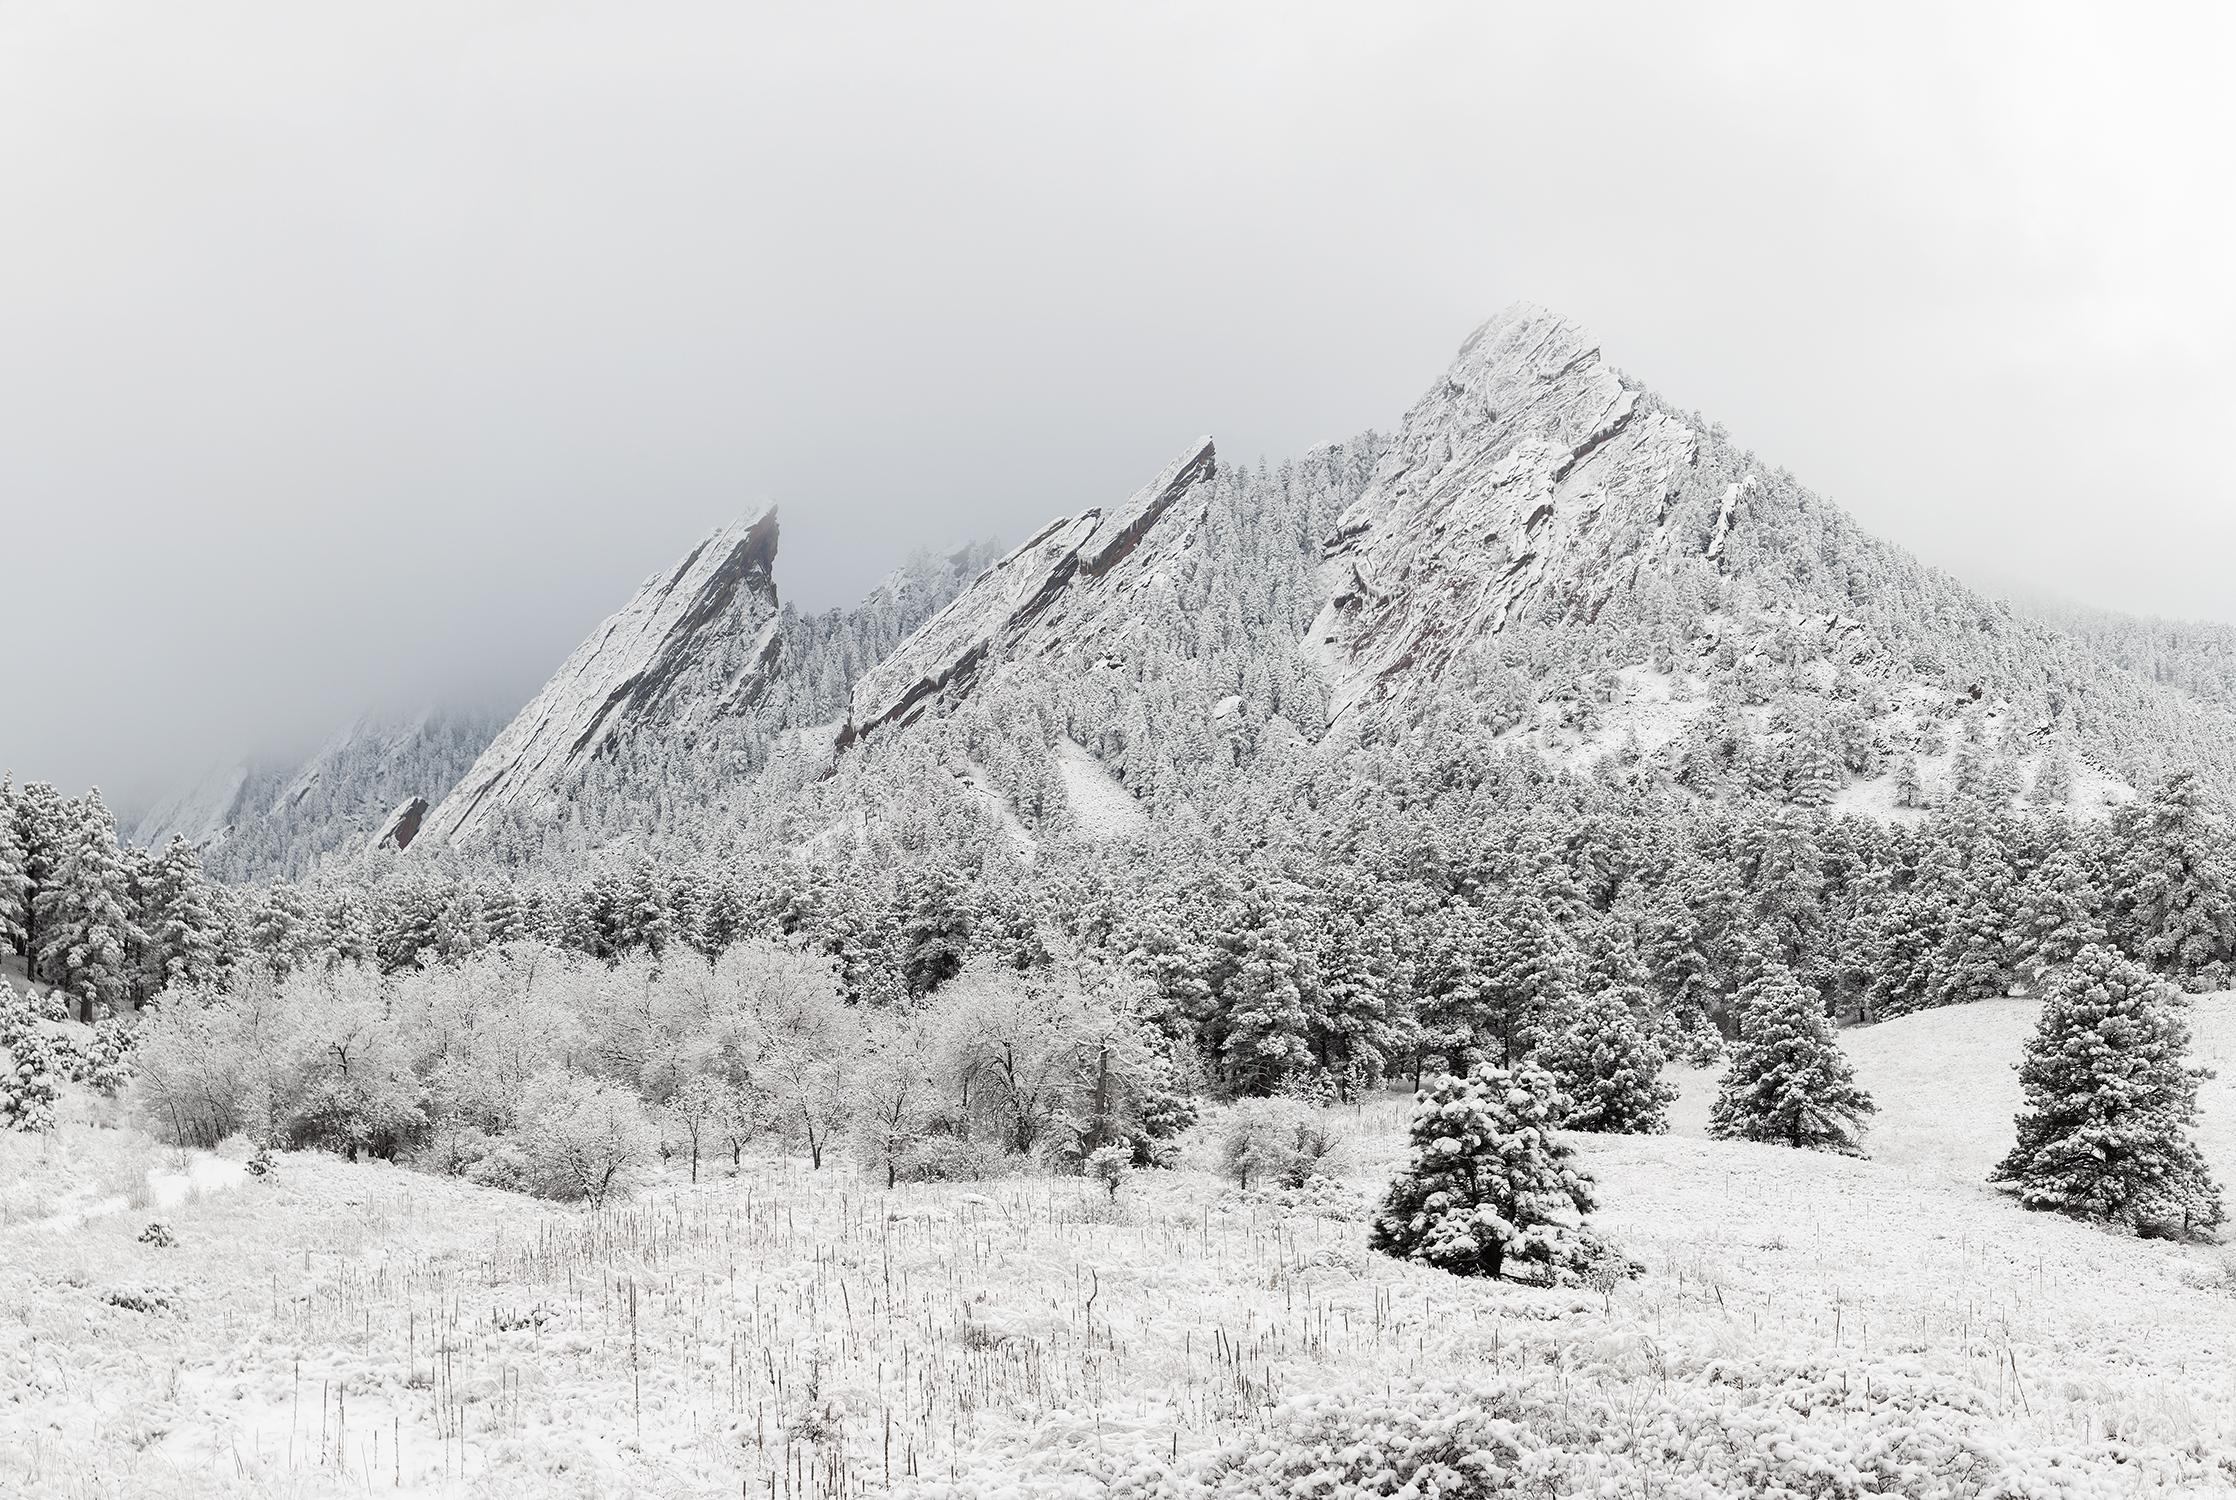 Flatiarons Snow Cloudy Day (small().jpg